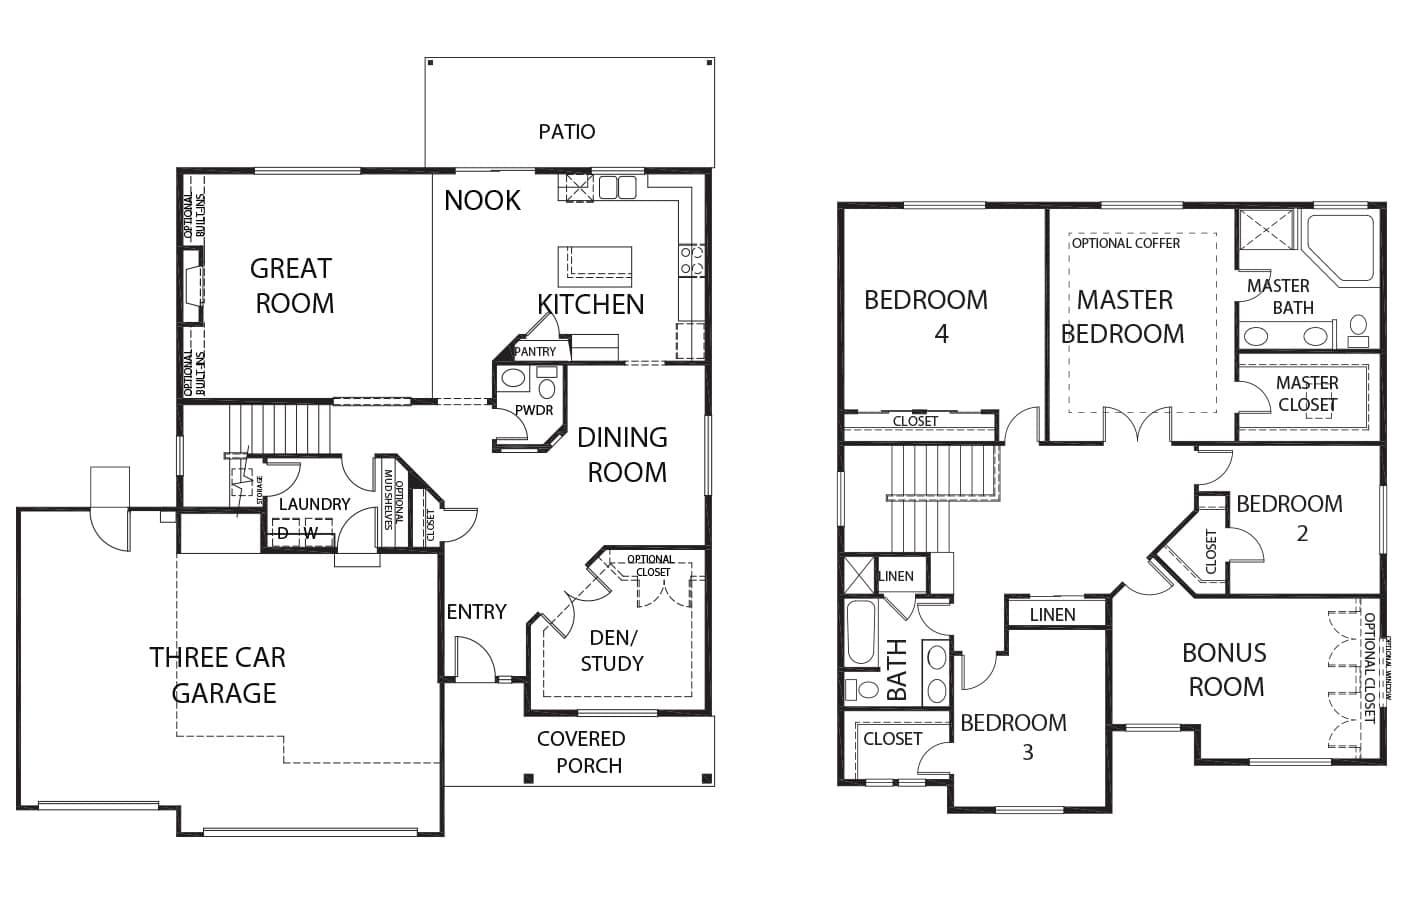 soundbuilt-teton-floorplan-2978-3car